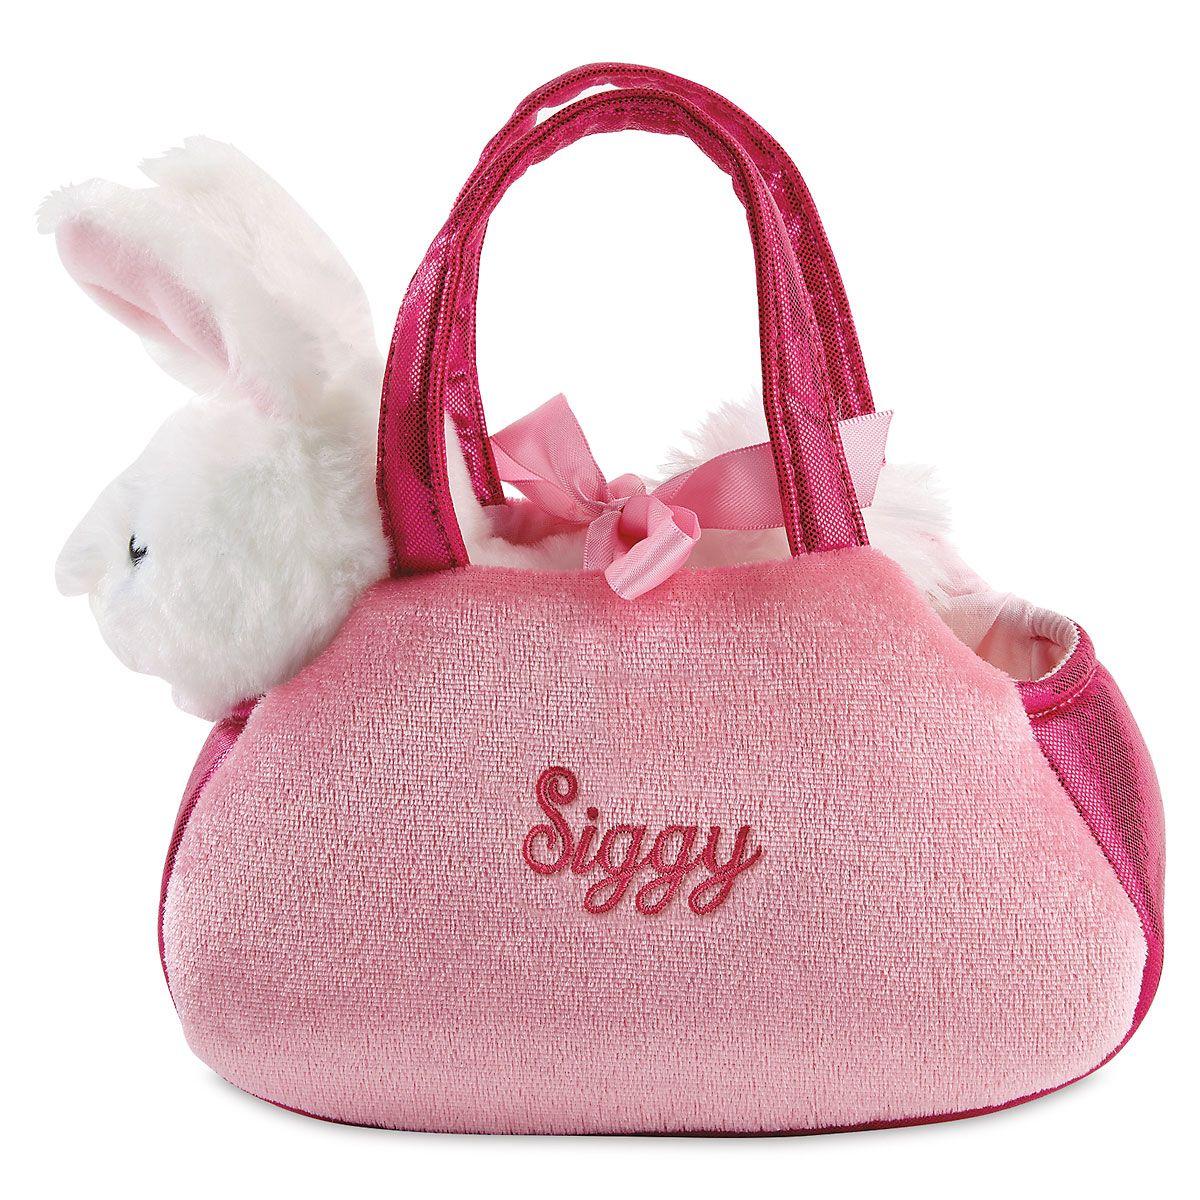 Peek-a-Boo Personalized Bunny Purse